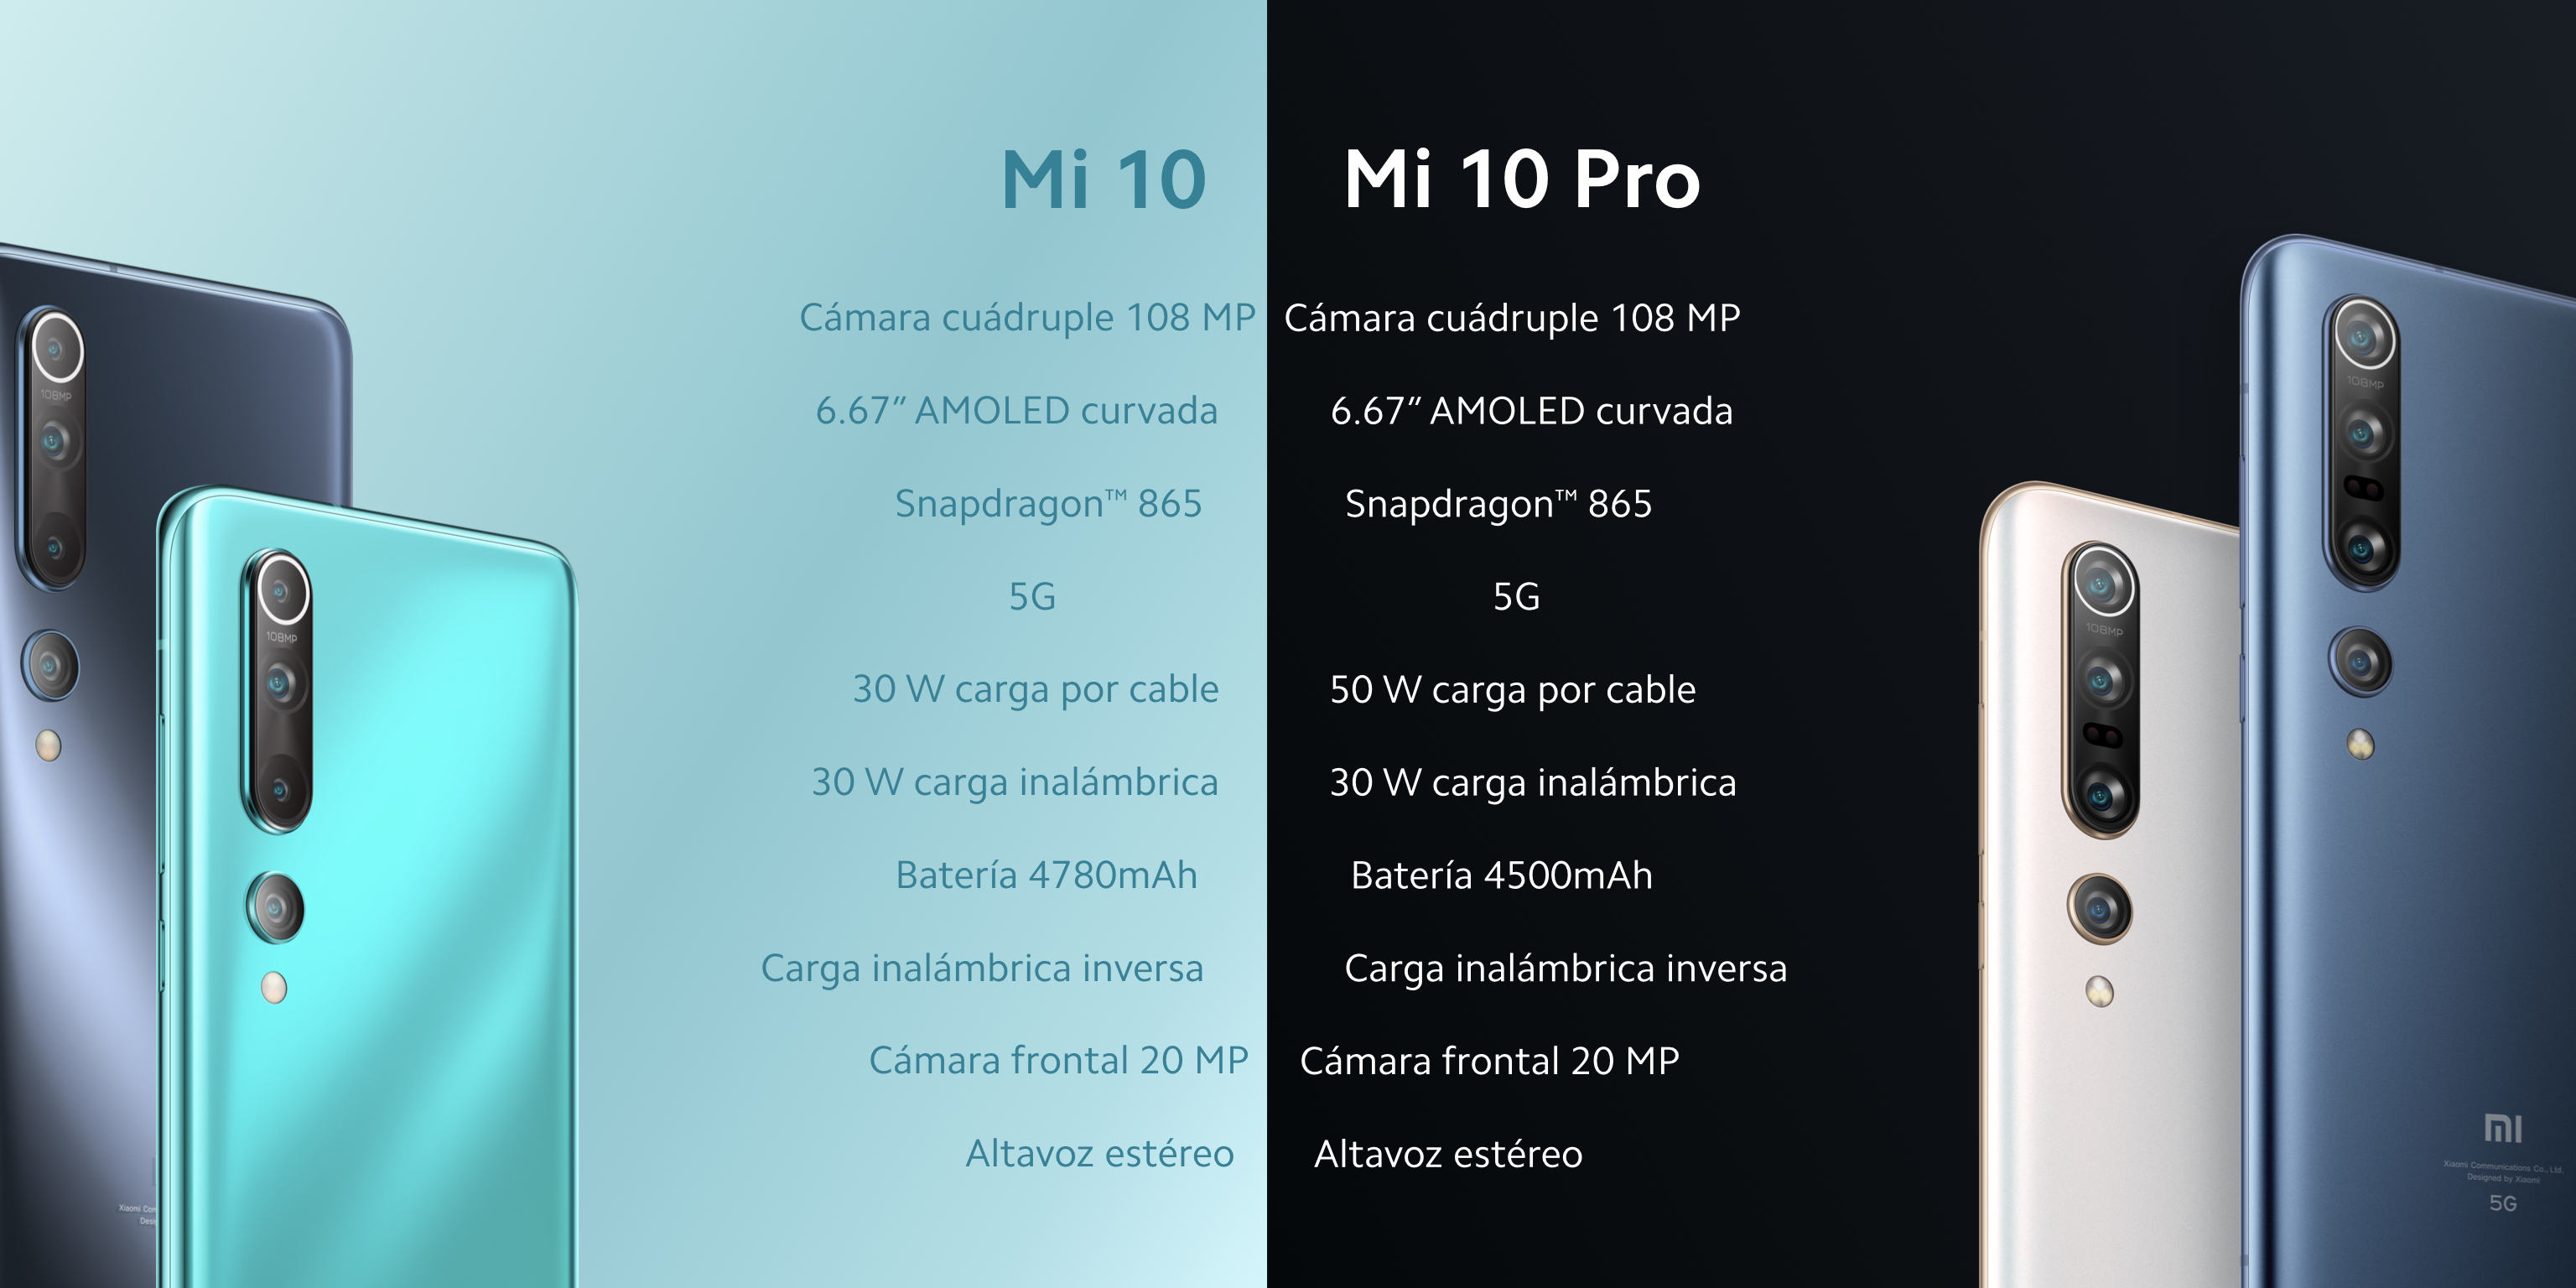 Xiaomi Mi 10 vs Mi 10 Pro